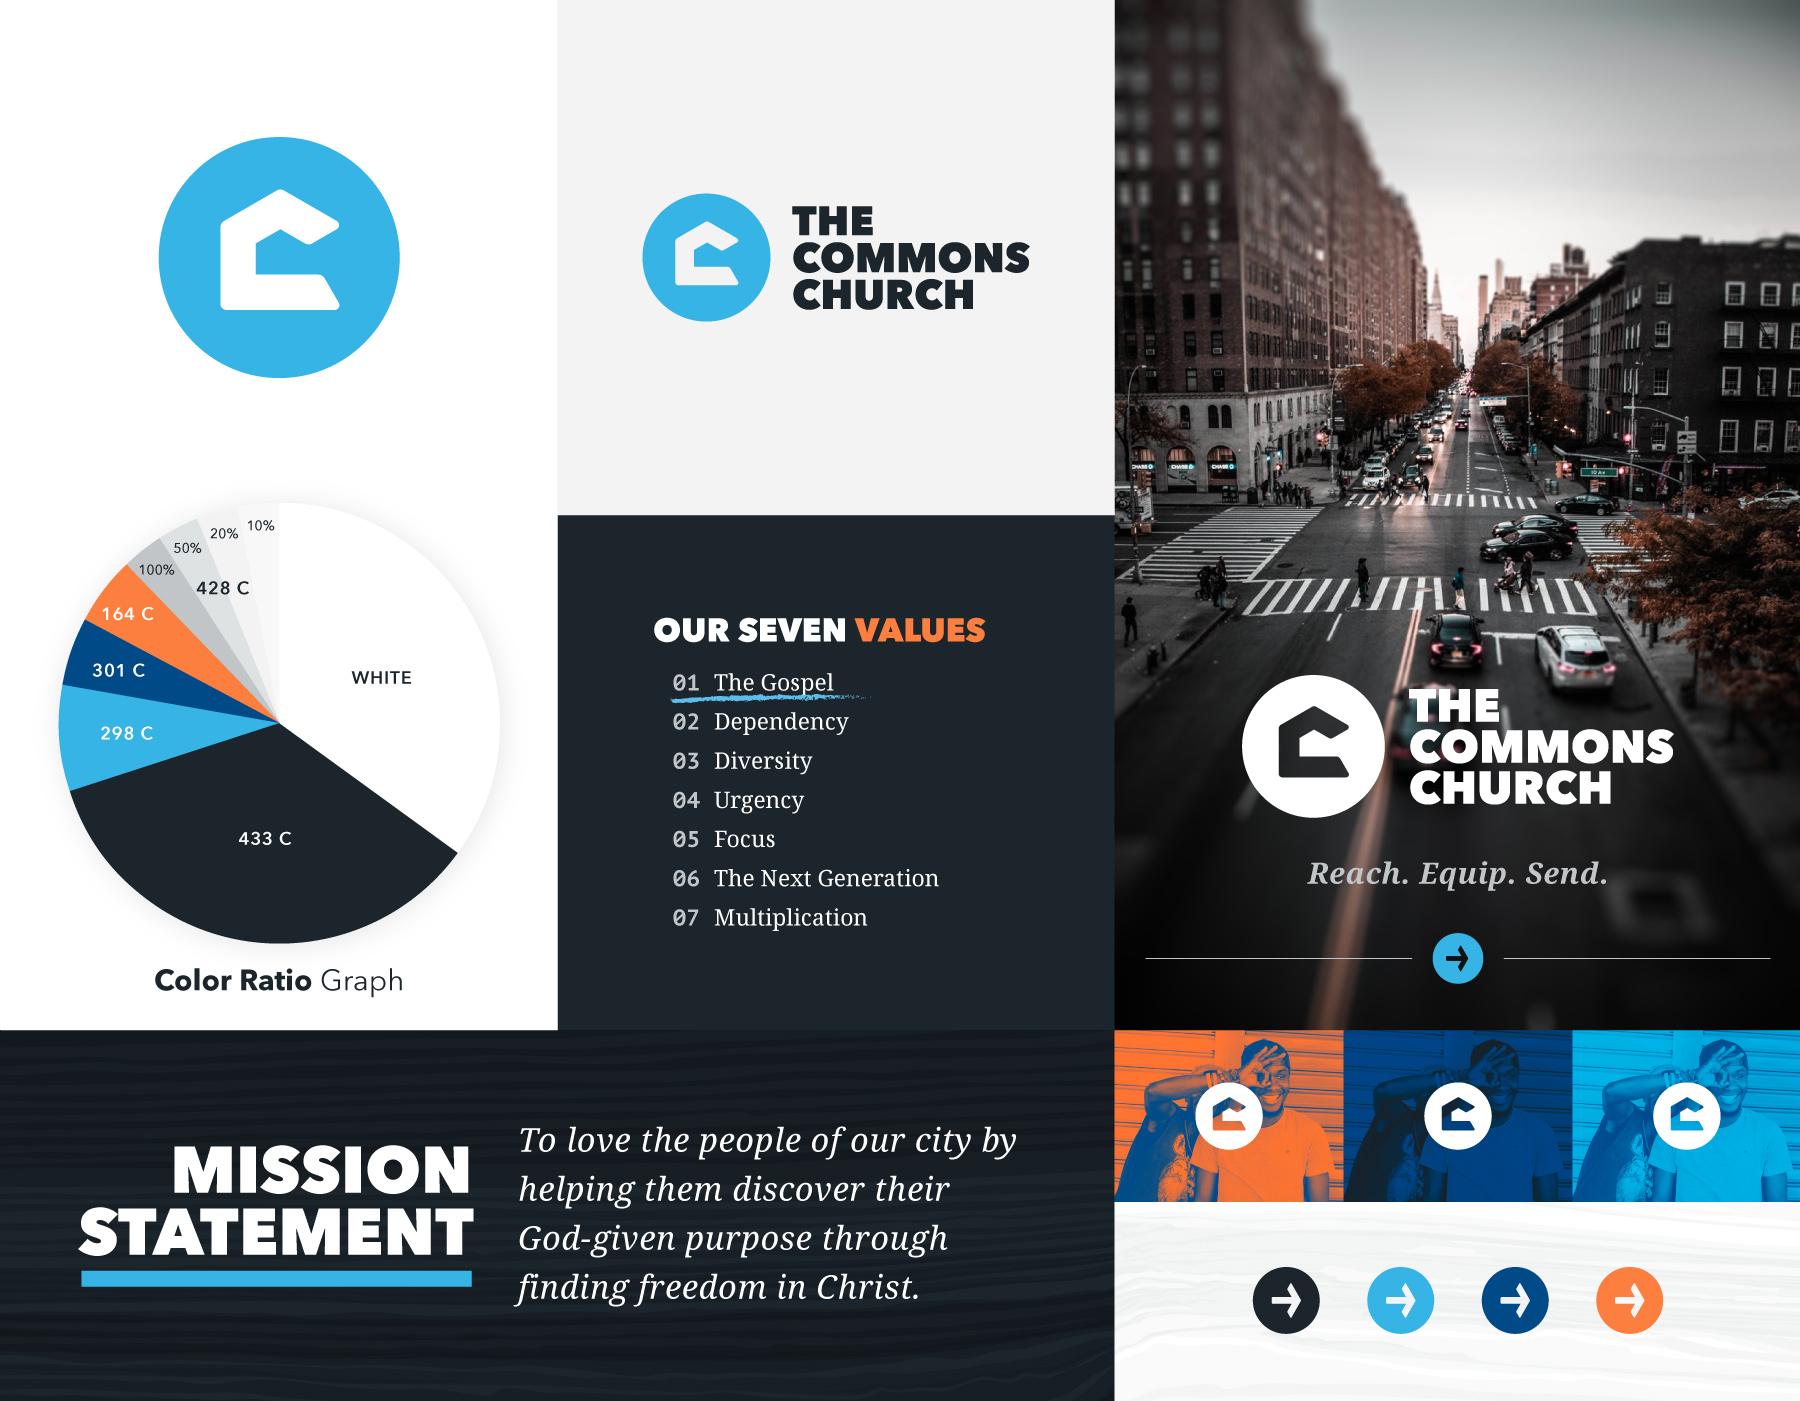 The Commons Church branding